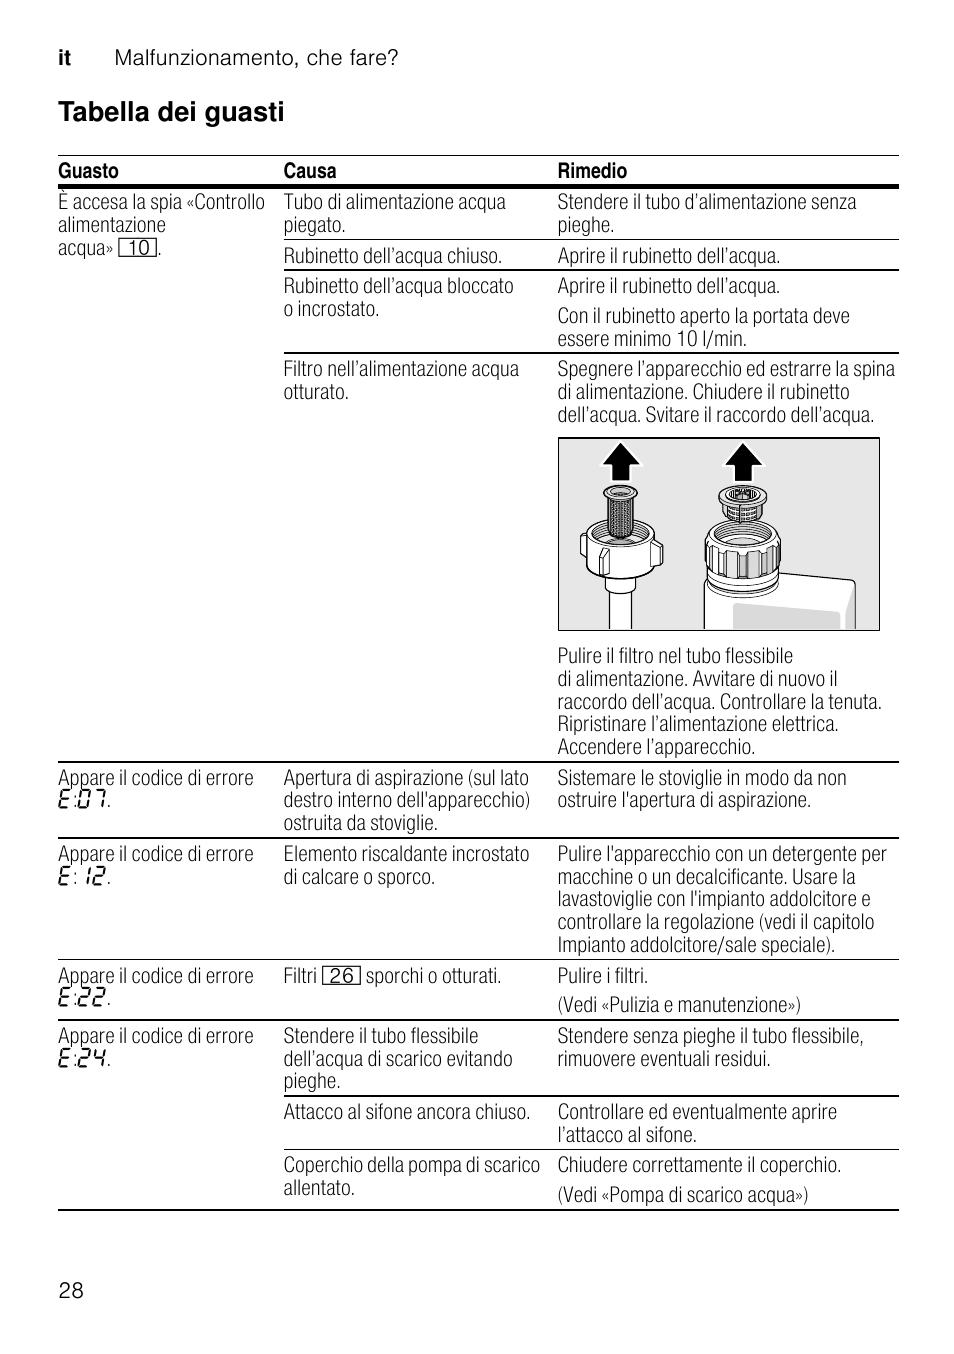 Tabella Dei Guasti Siemens Sn26d800ii Manuale D Uso Pagina 28 44